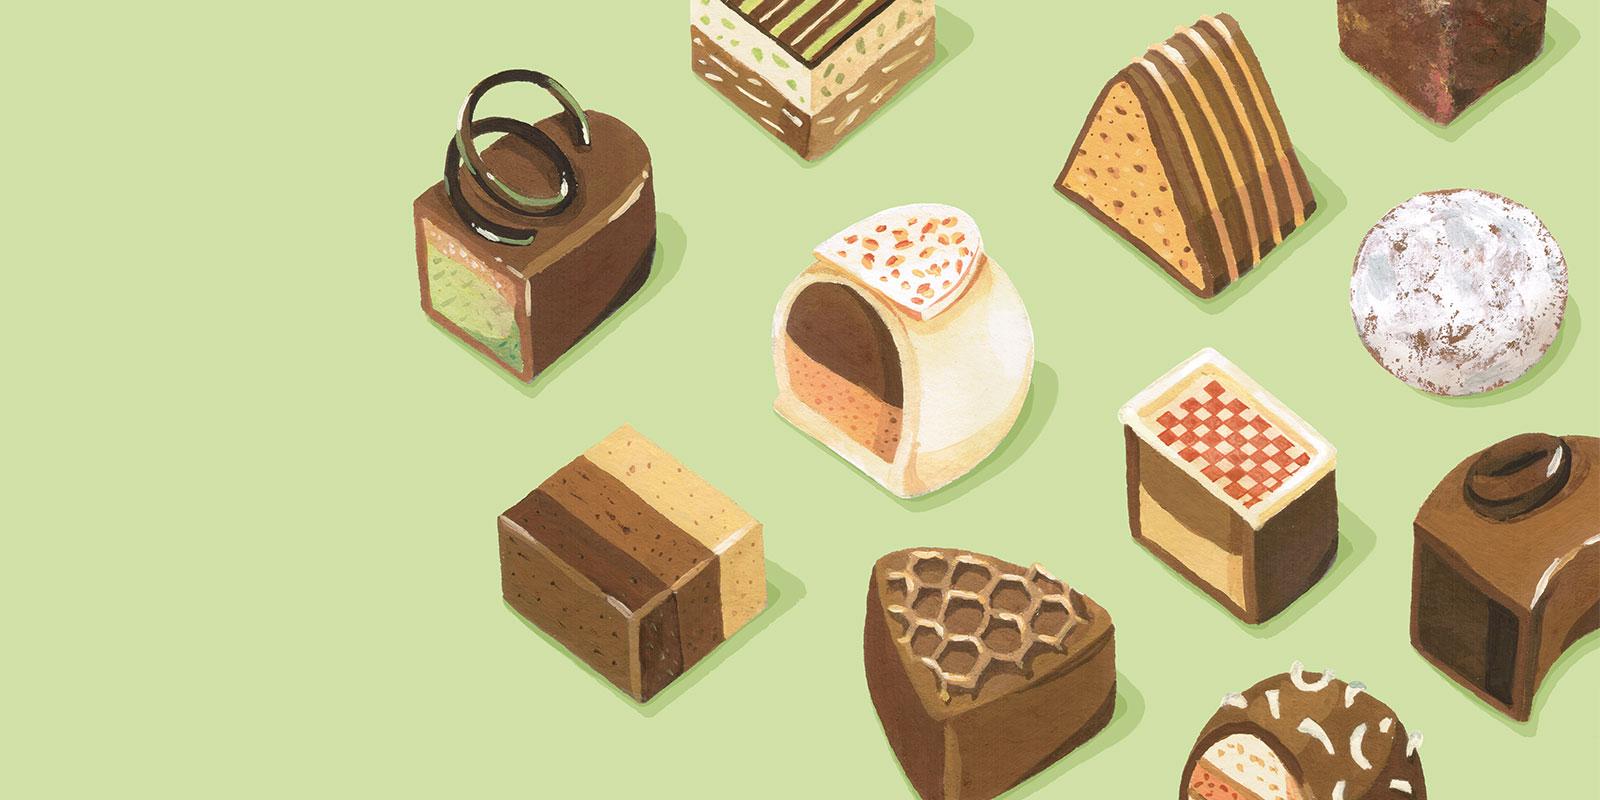 Chocolates_AndreaGonzalez_AllRightsReserved.jpg